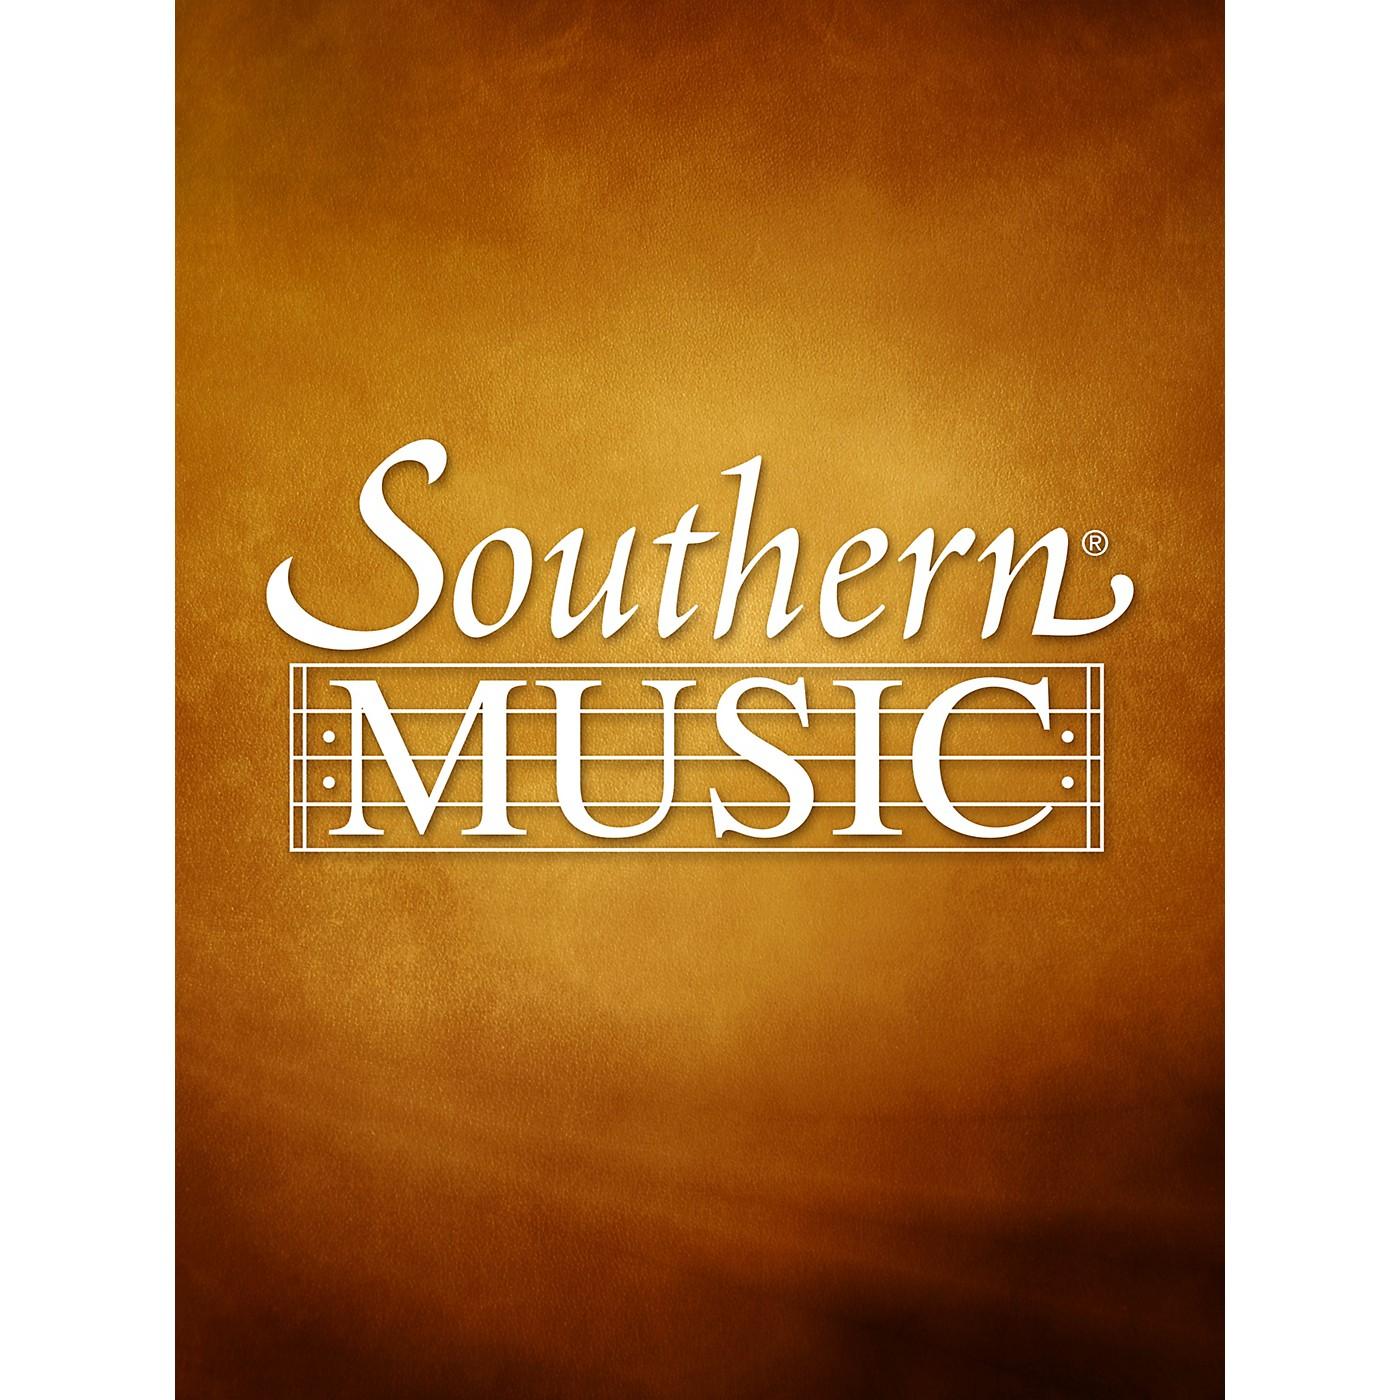 Southern March Kawasaki (Band/Concert Band Music) Concert Band Level 3 Composed by James Barnes thumbnail